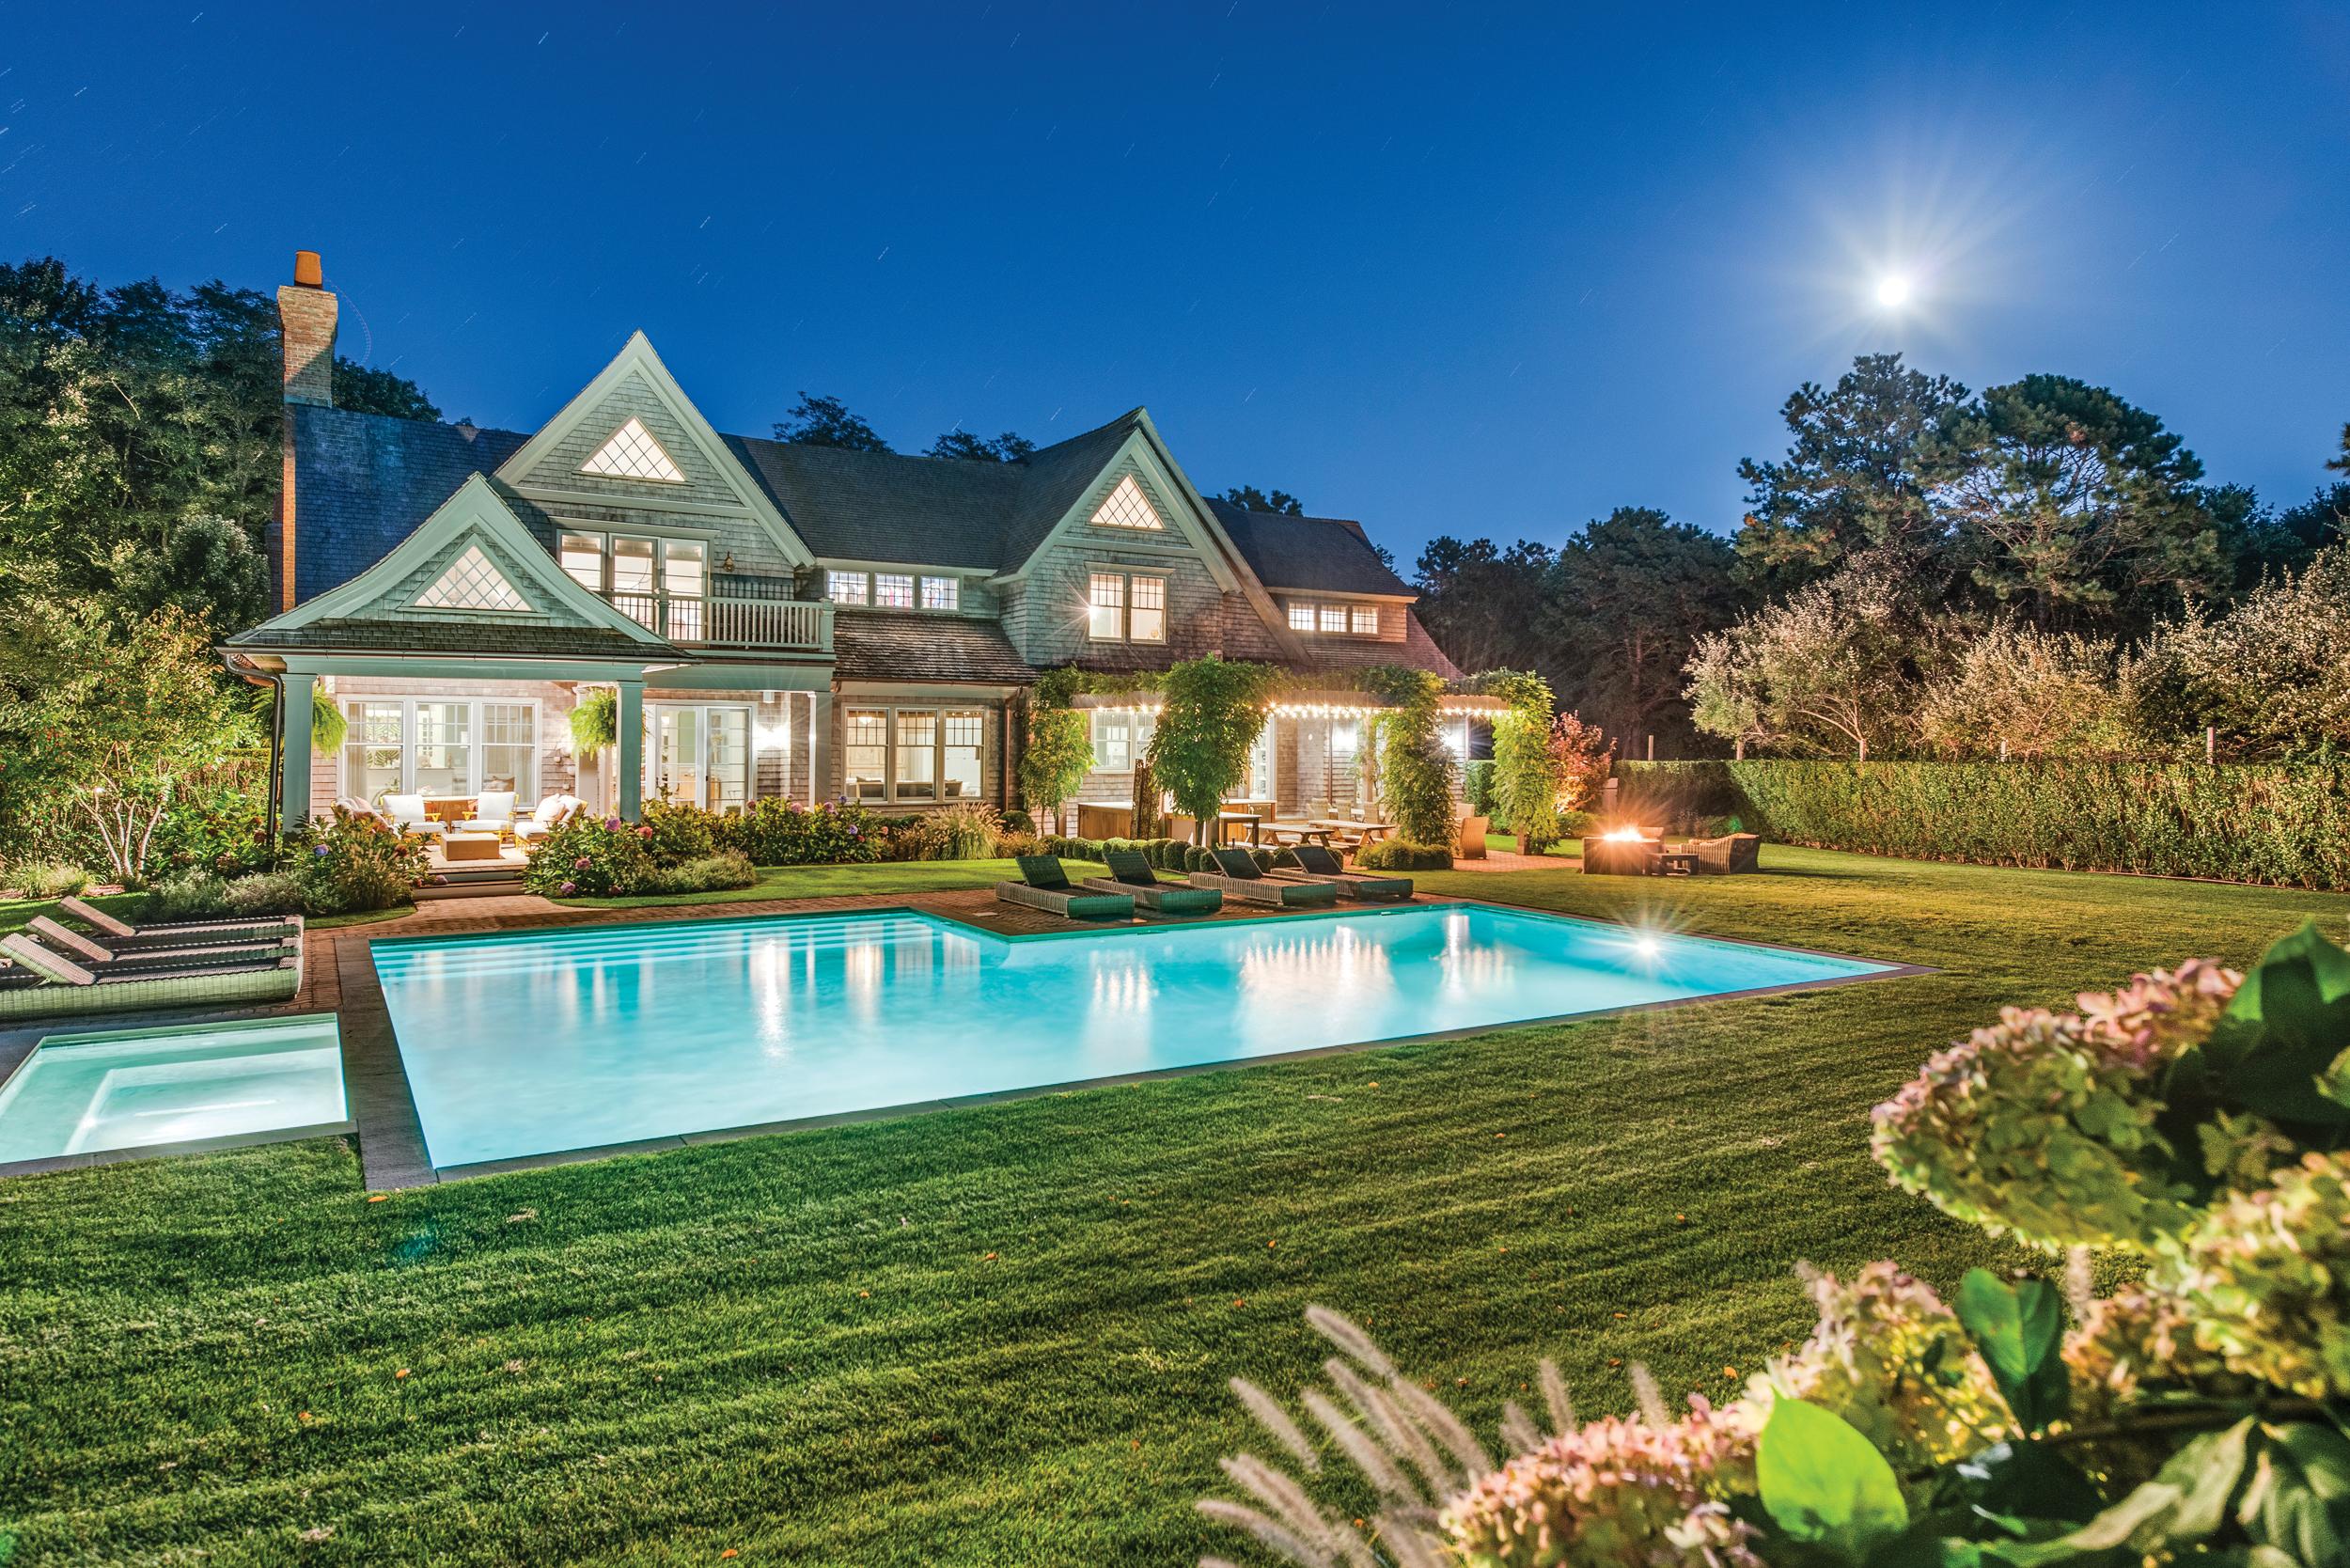 RI real estate photographer